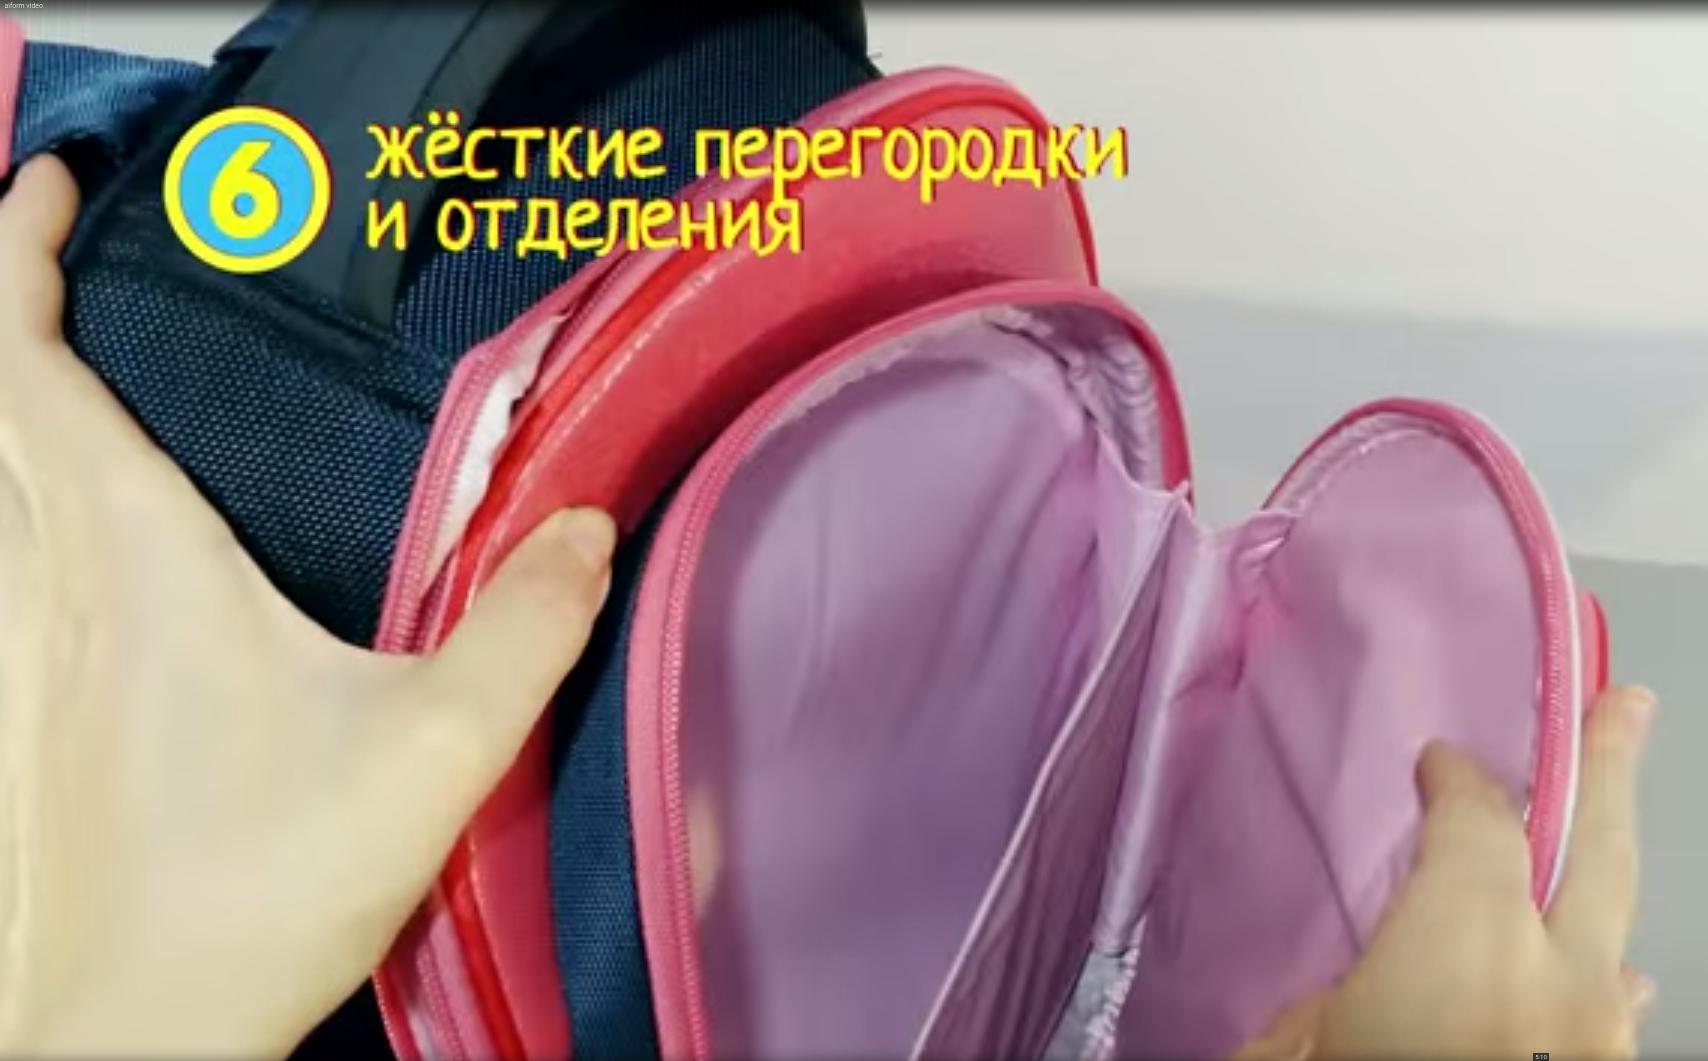 Ранец для первоклассника Hummingbird TK60 Футбол серый с мешком для обуви + пенал, - фото 10